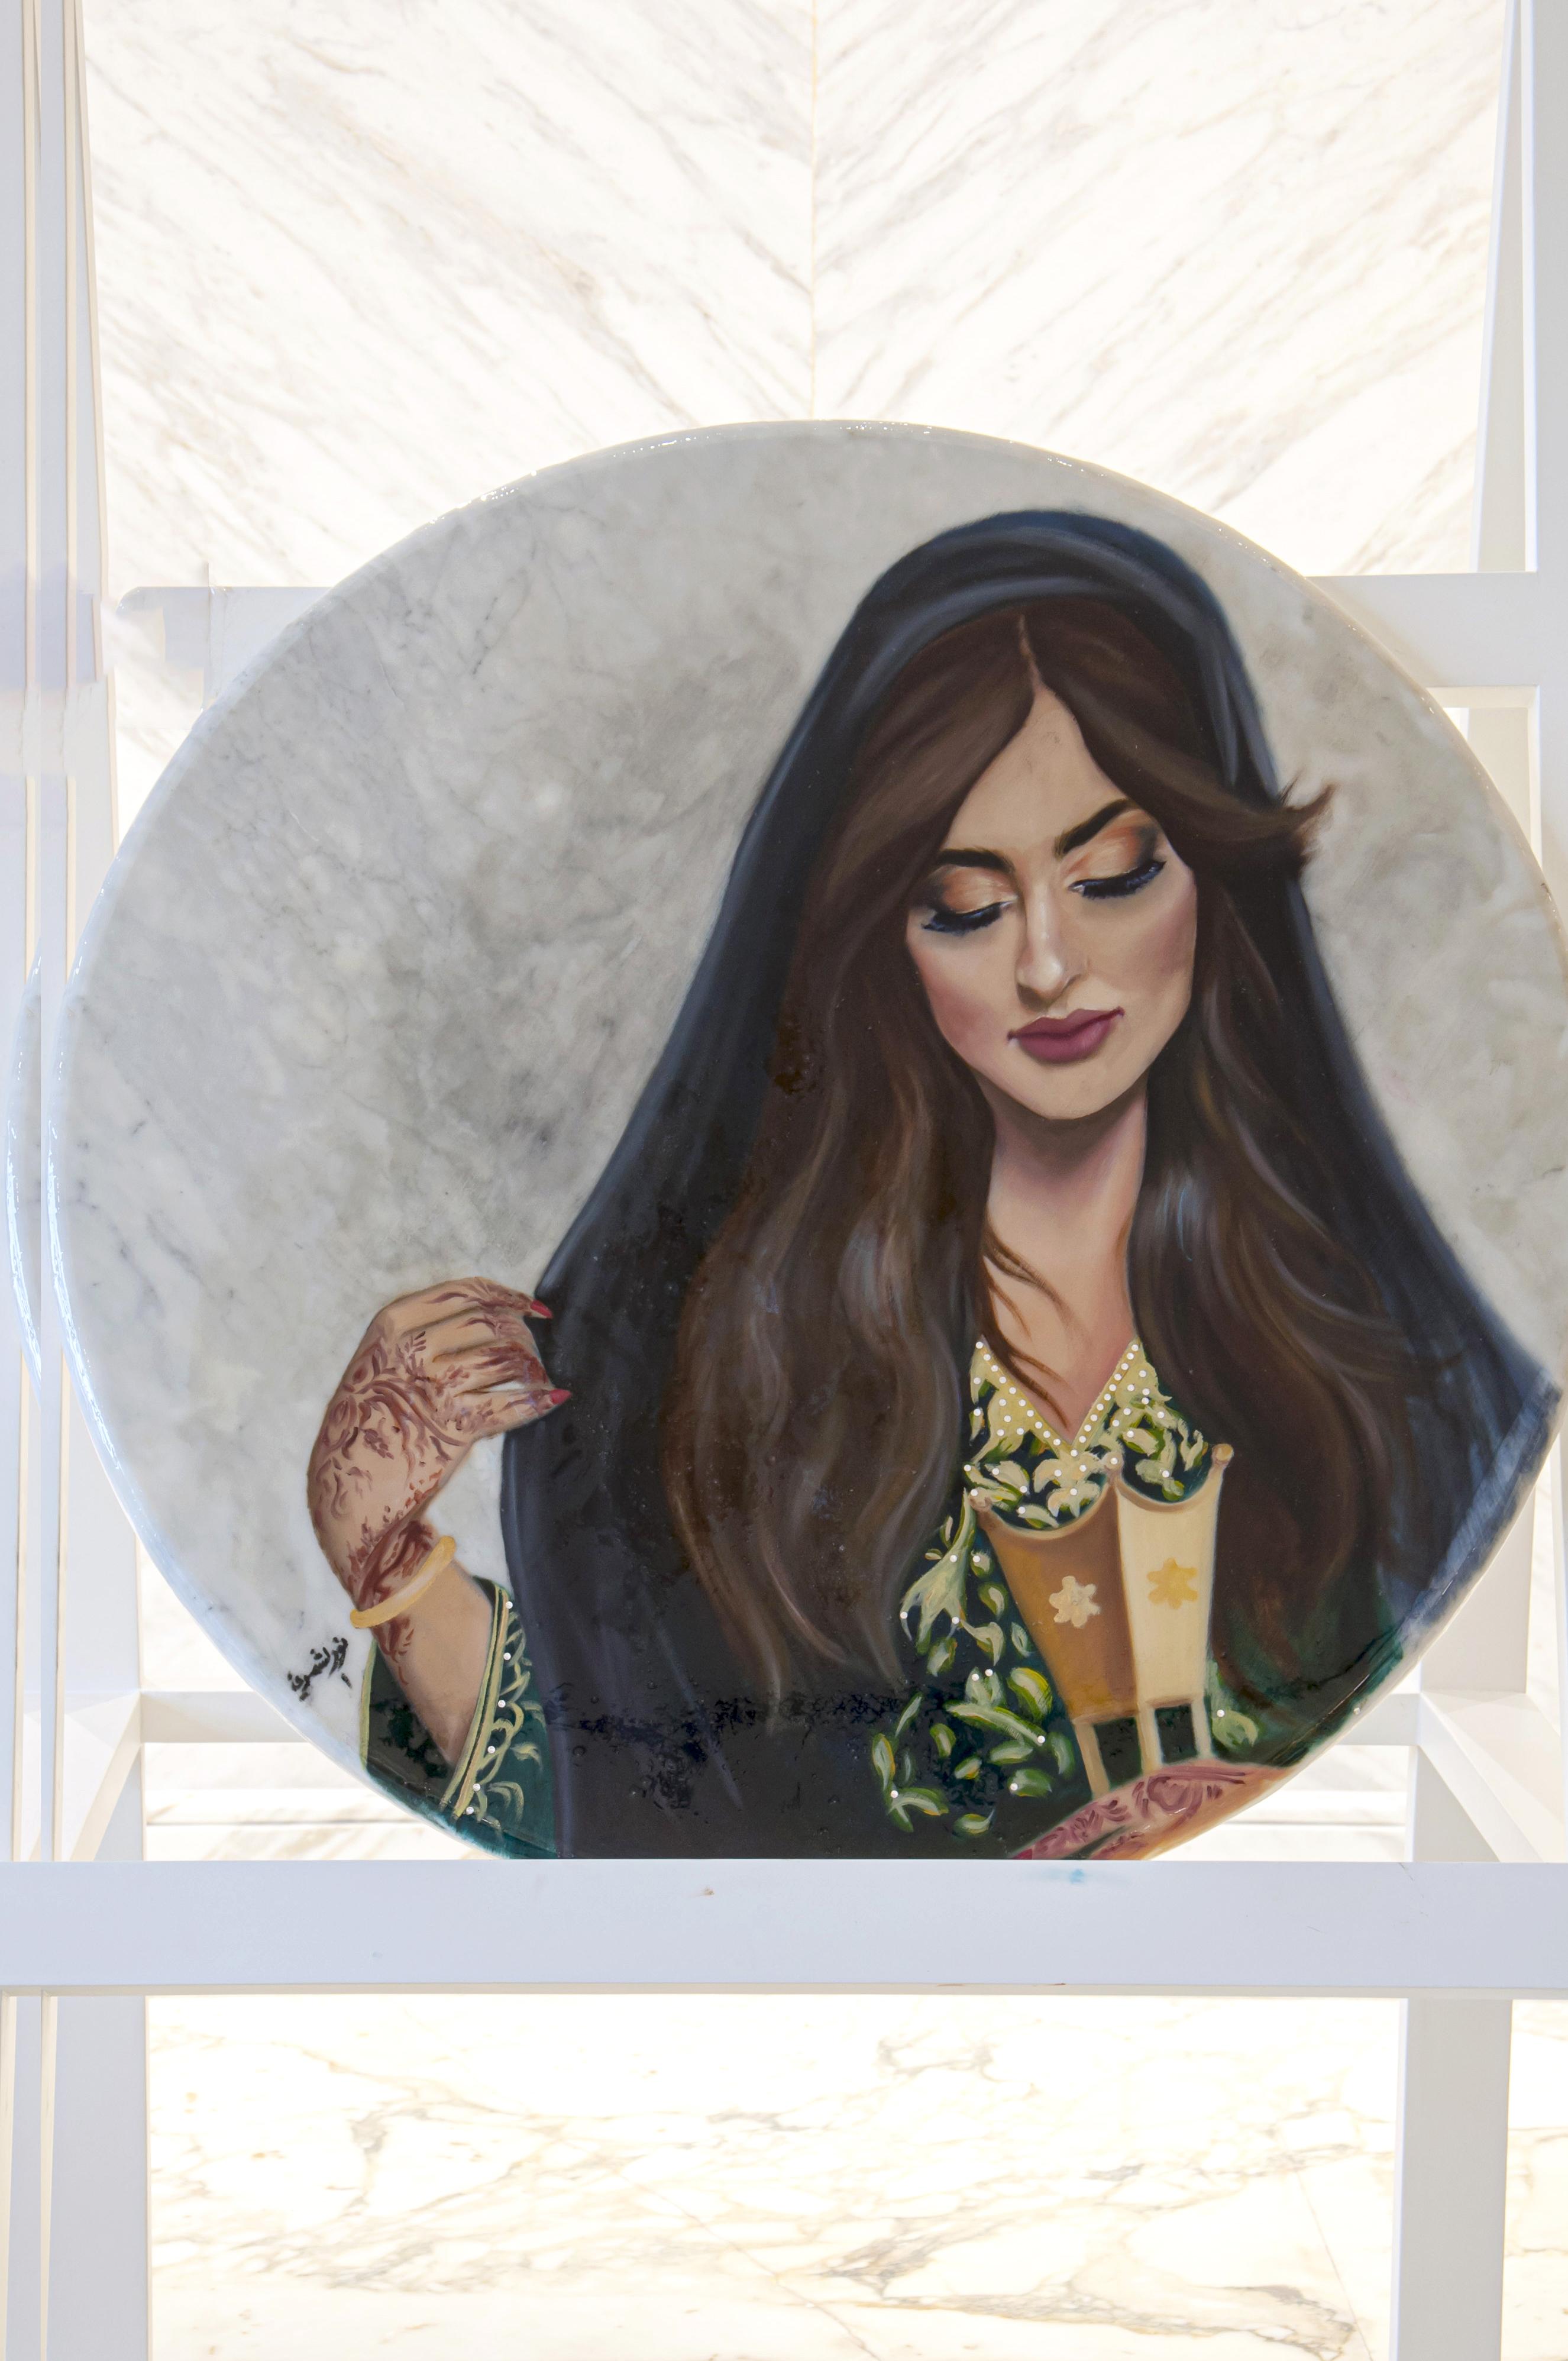 Untitled artwork by Noor Al Shammri - art listed for sale on Artplode